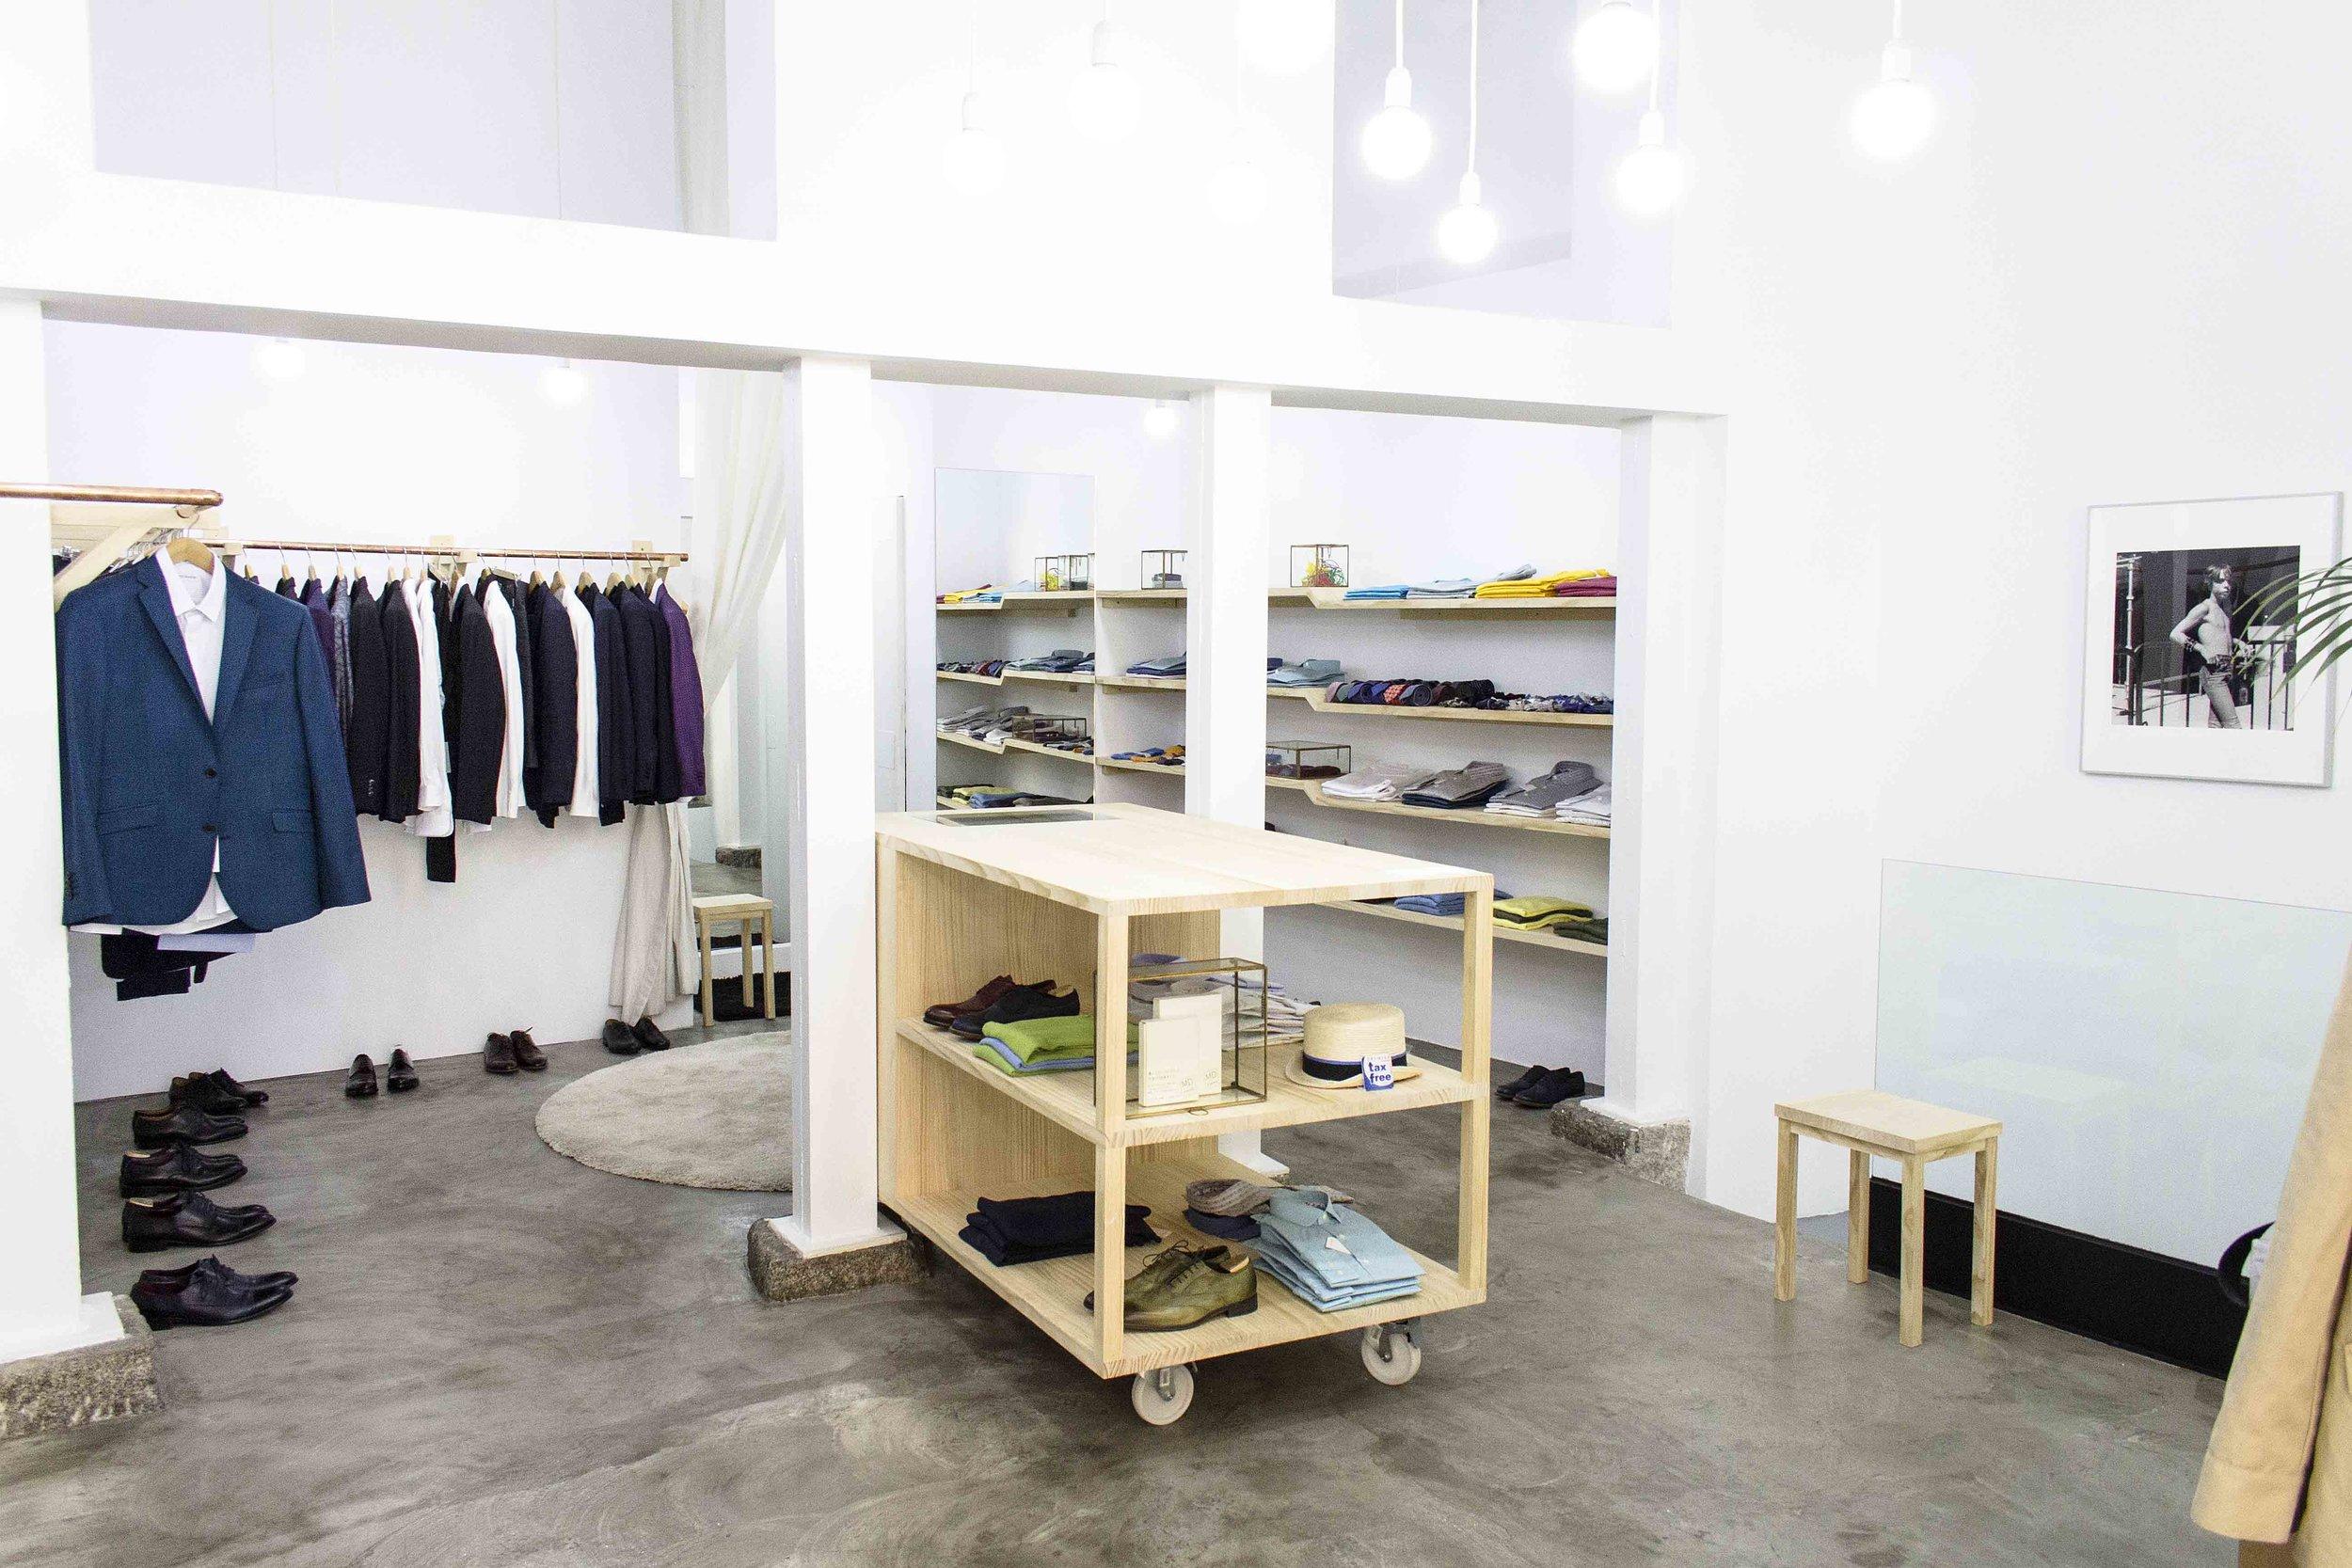 GarciaMadrid-tiendas-Madrid.jpg